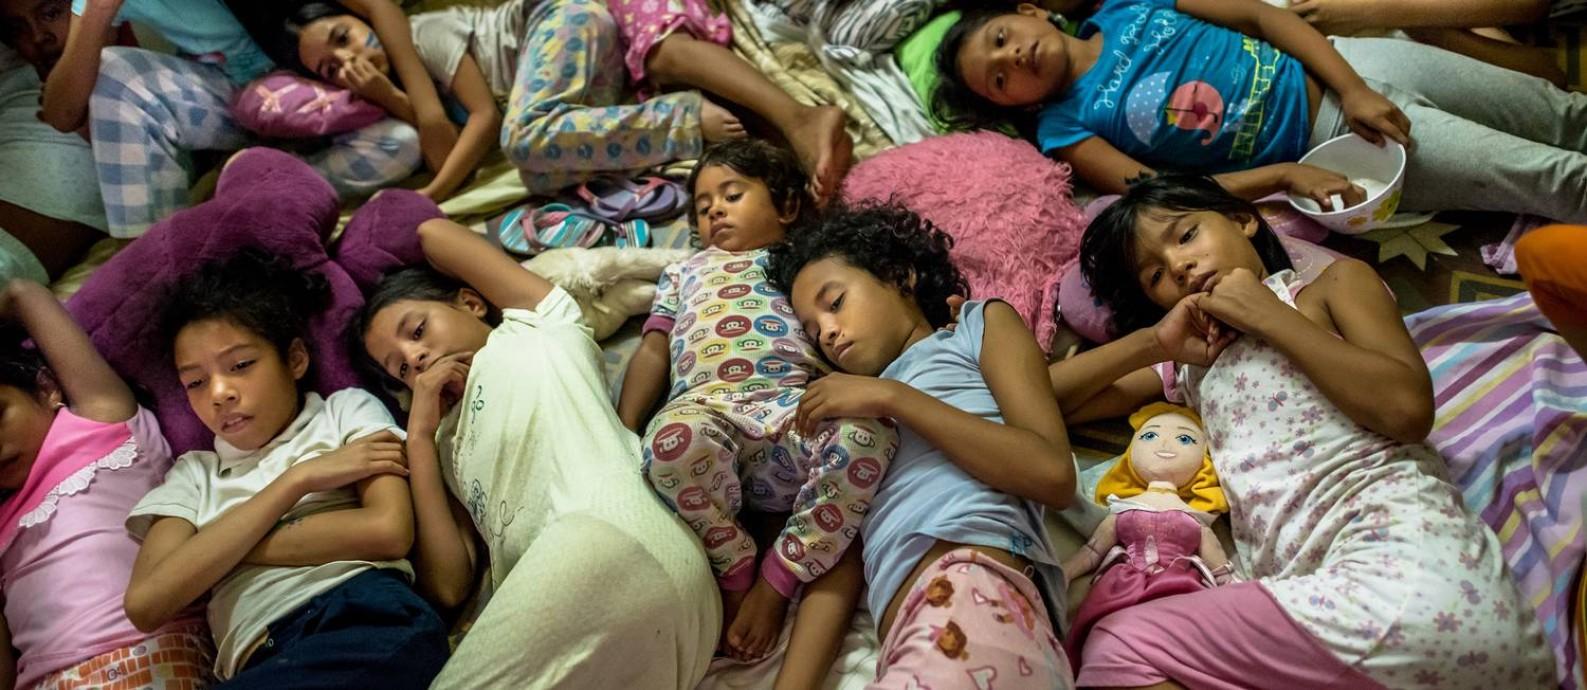 Crianças na Casa Hogar Carmela Valera, em Maracaibo, na Venezuela Foto: Meridith Kohut / NYT